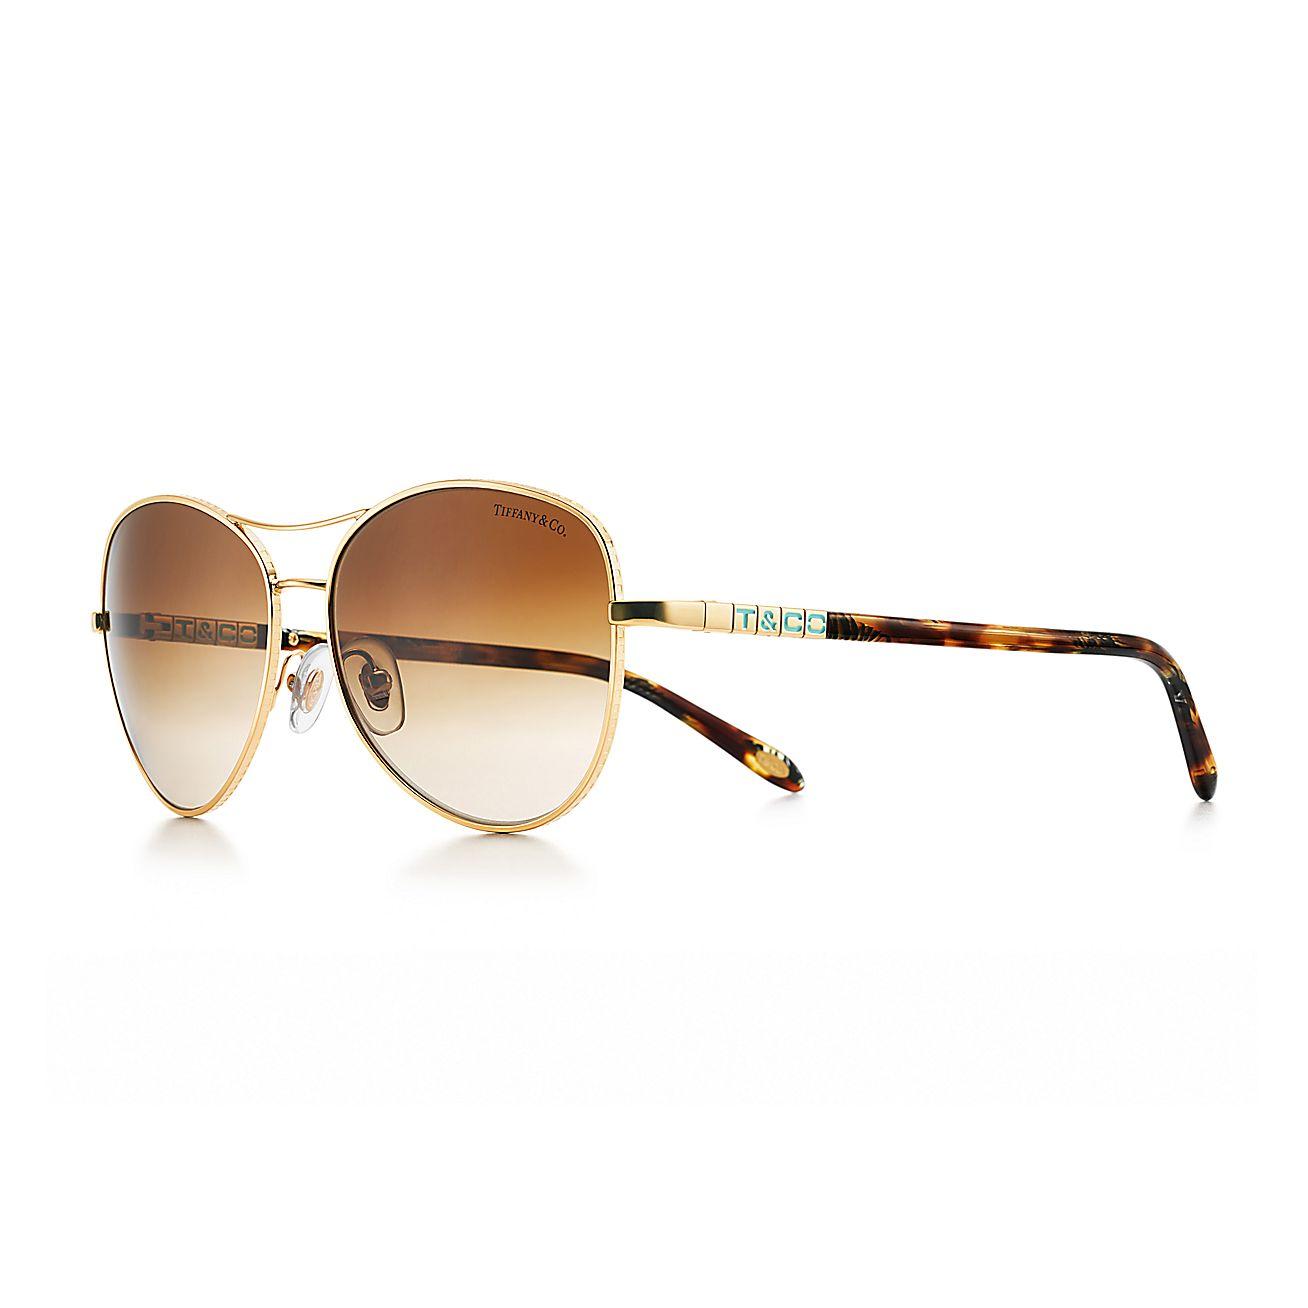 Tiffany Era:Aviator Sunglasses